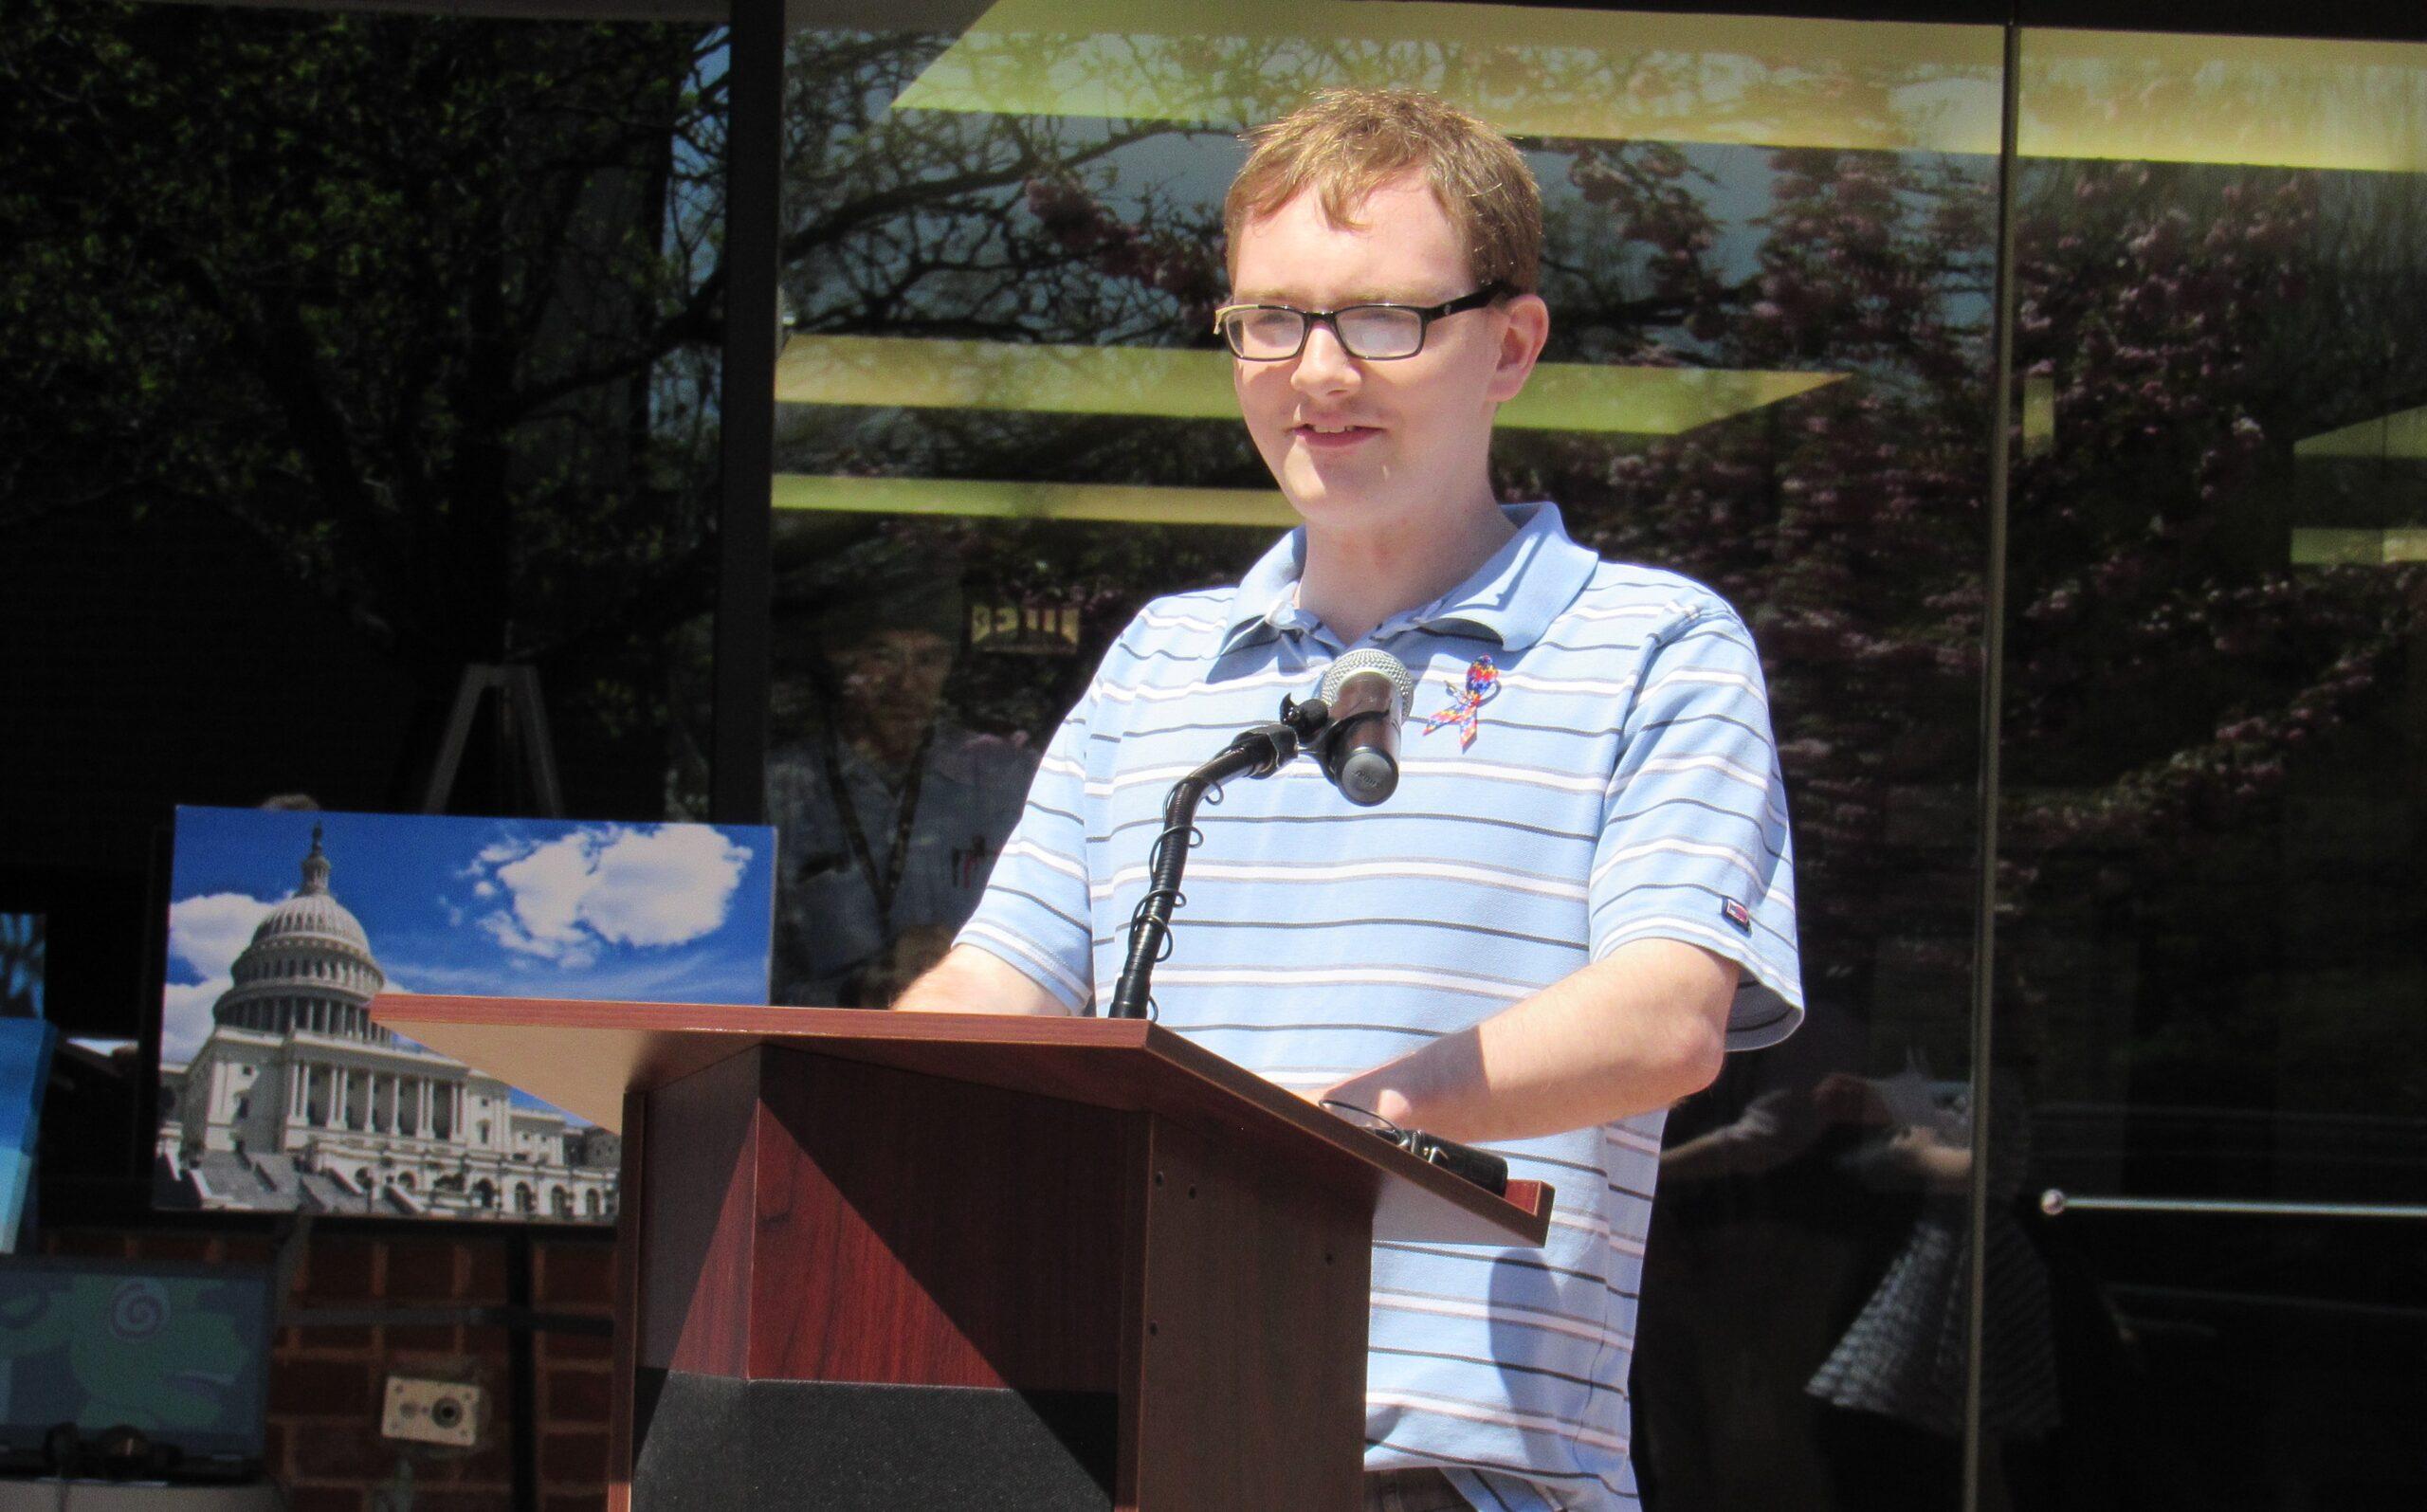 Man at podium speaking into microphone